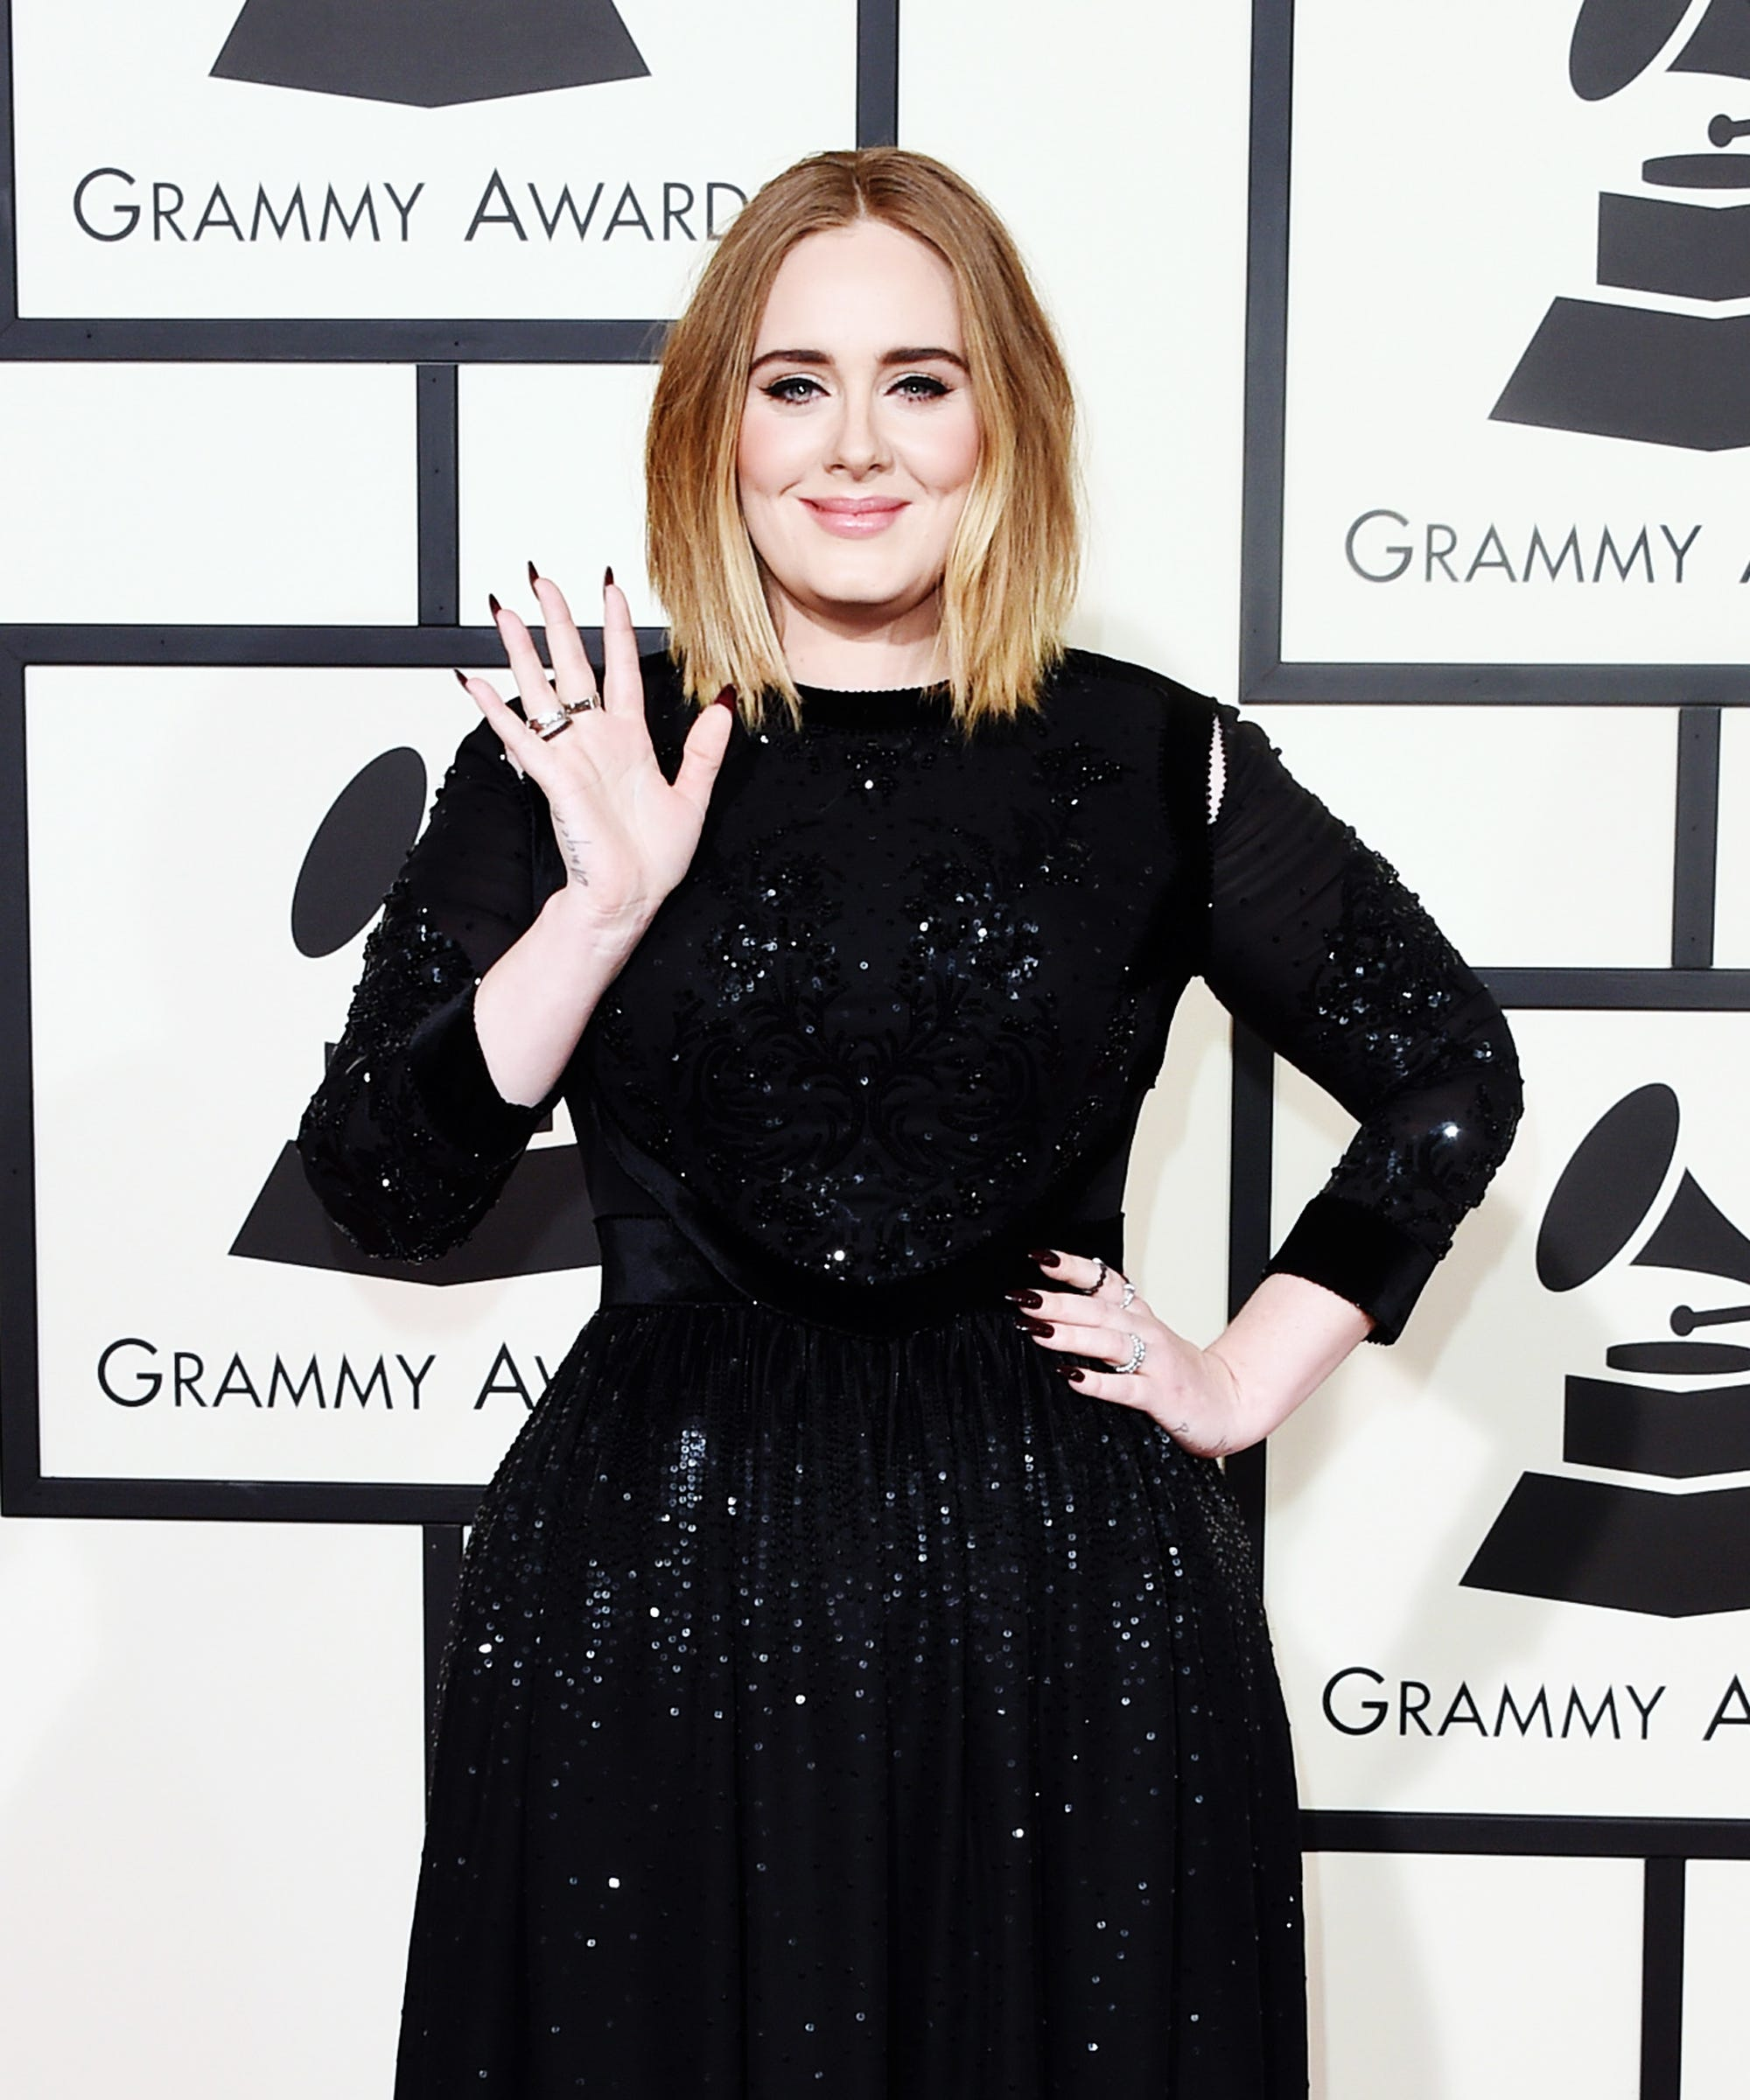 a49bfc705 Grammys 2016 Best Dressed Red Carpet Photos